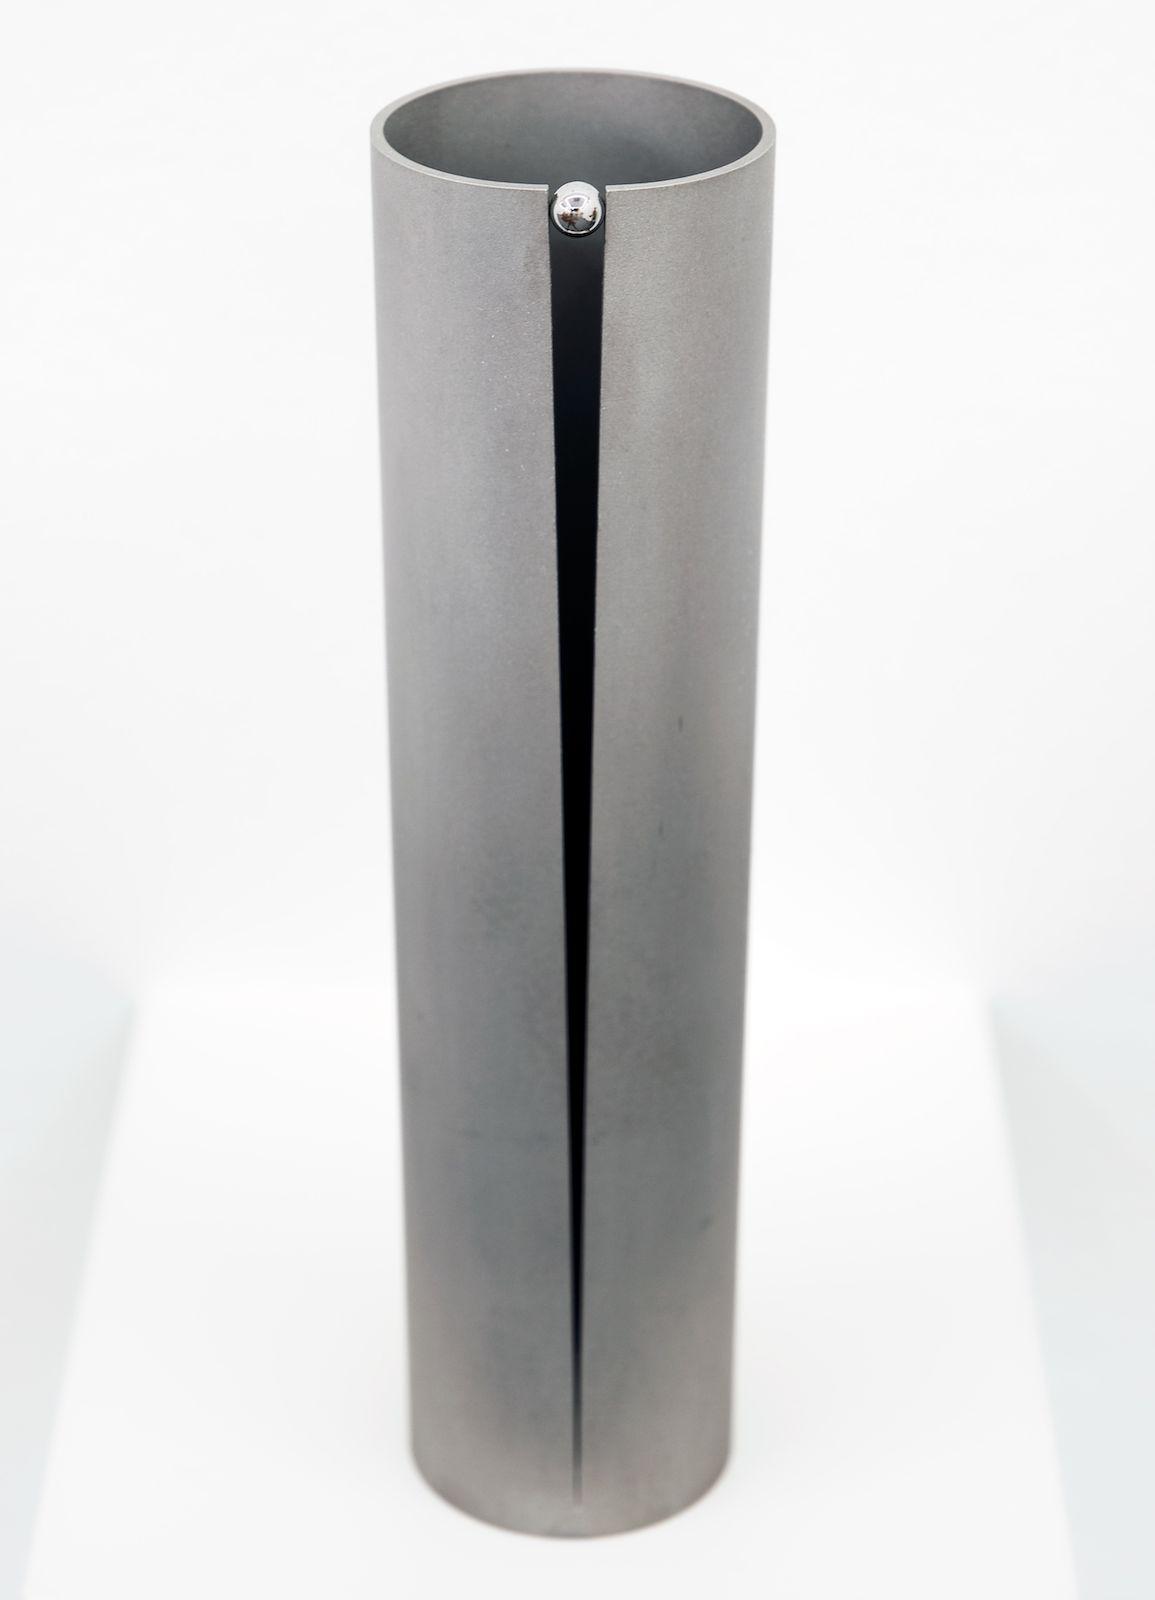 Glide, 2008, stainless steel, 16,5 x Ø 4 cm